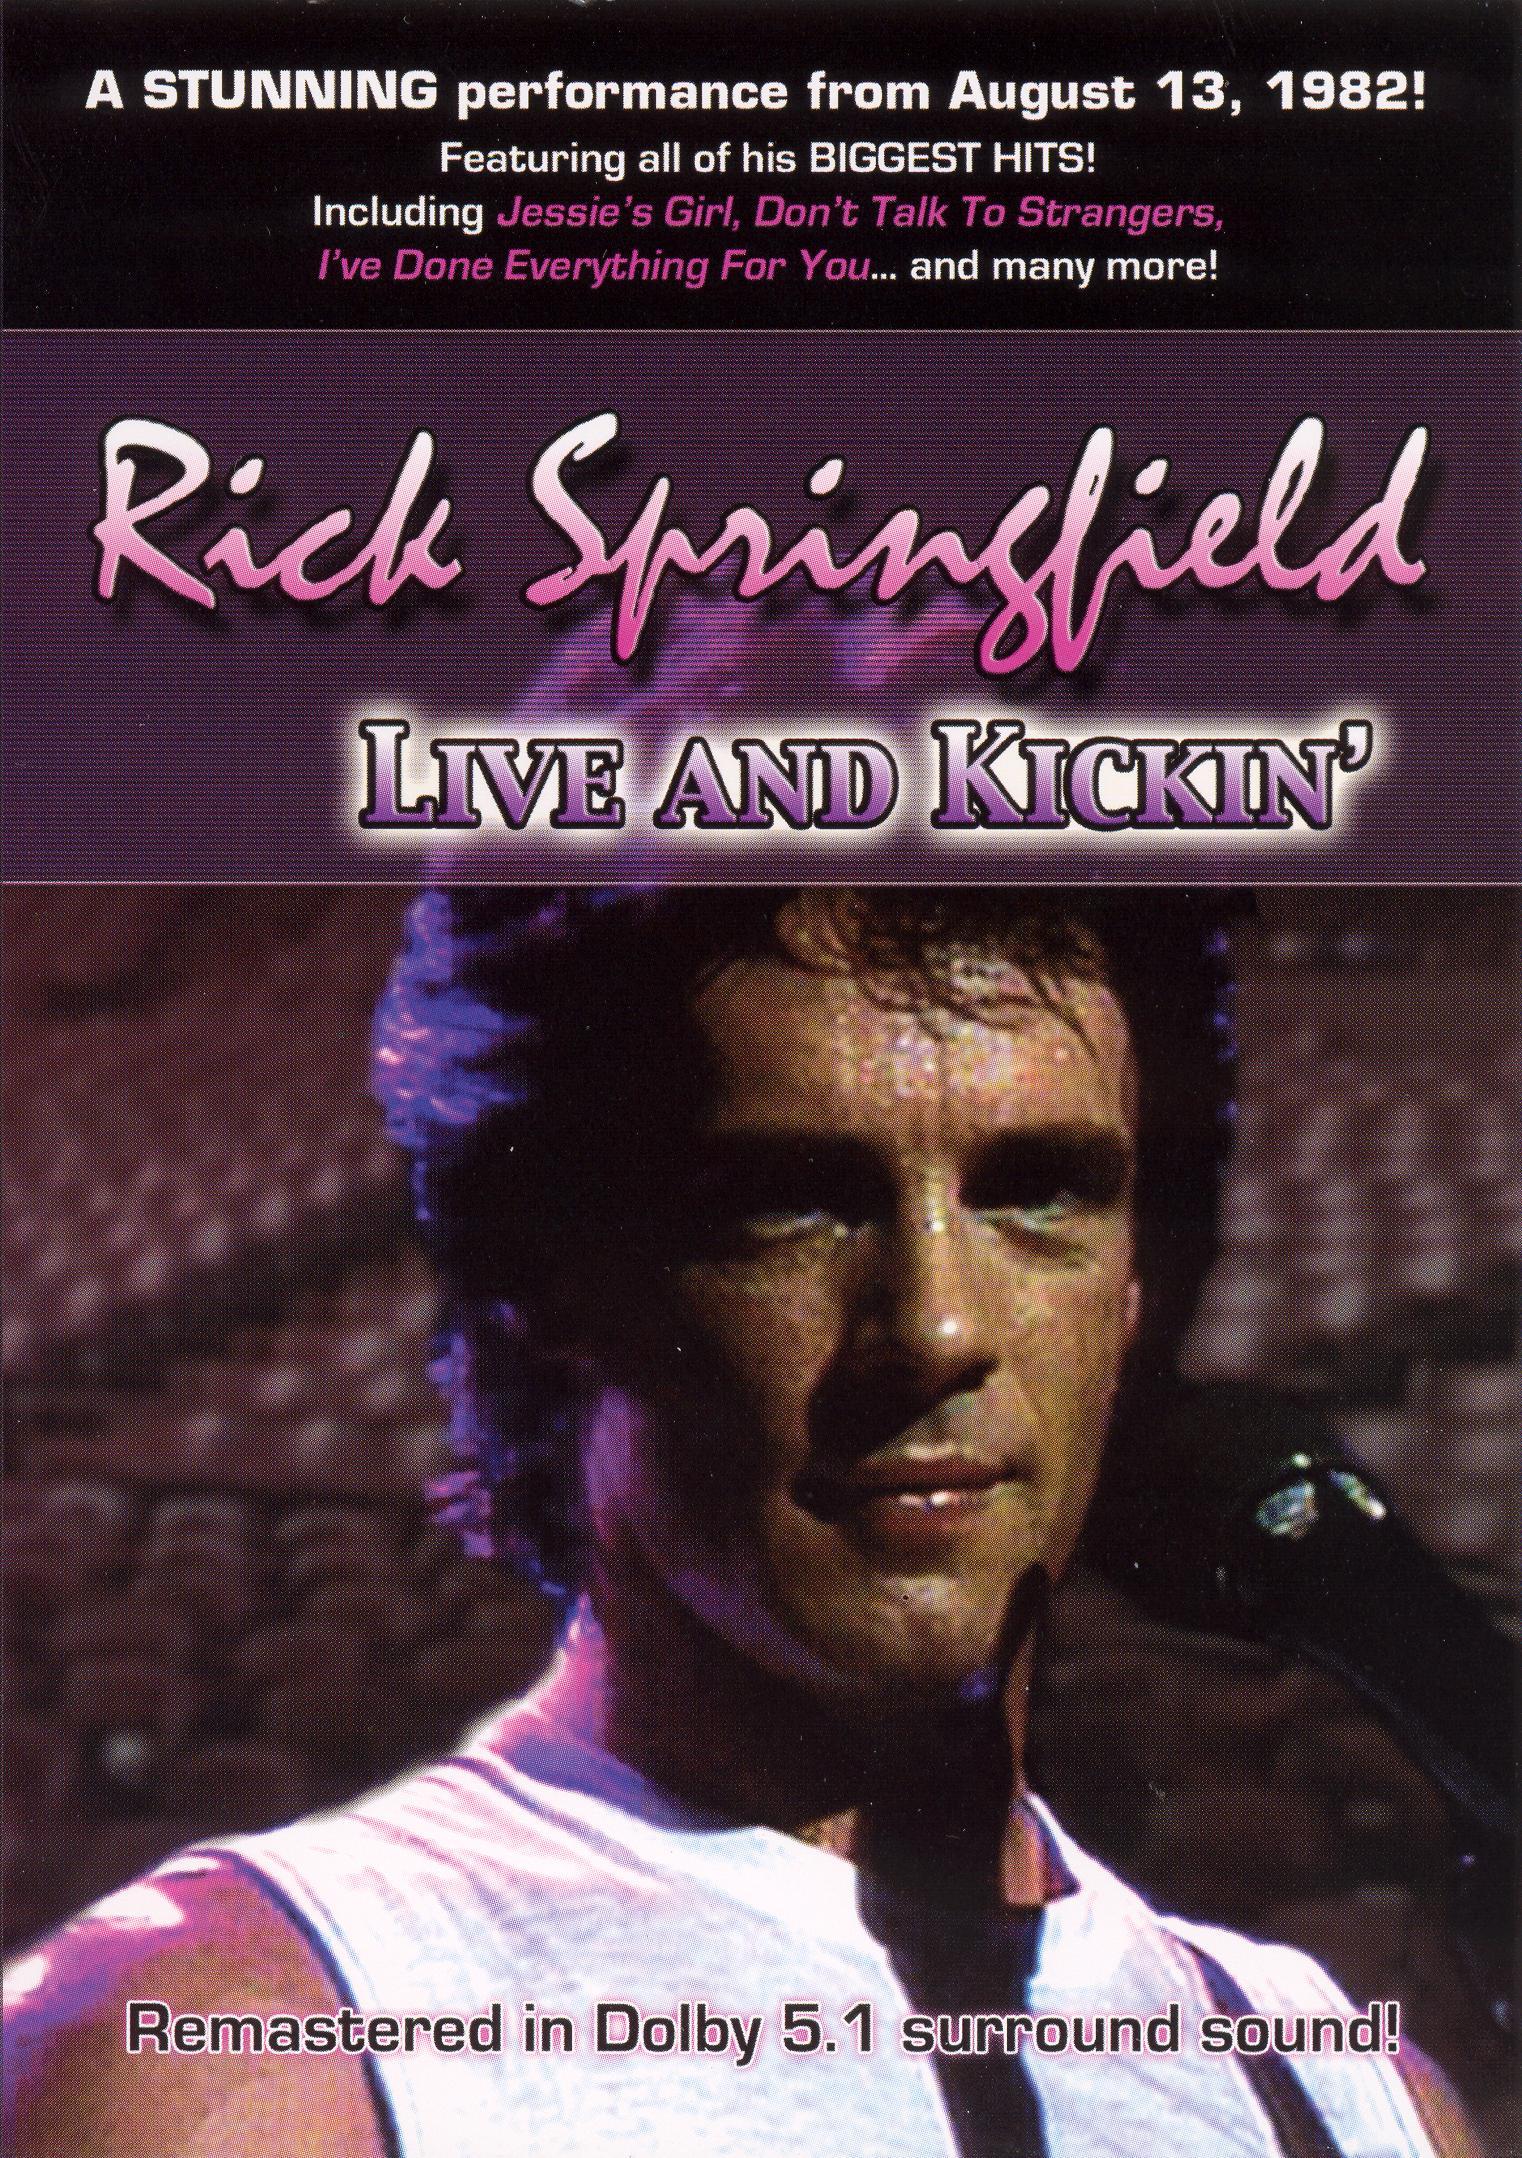 Rick Springfield: Live and Kickin'